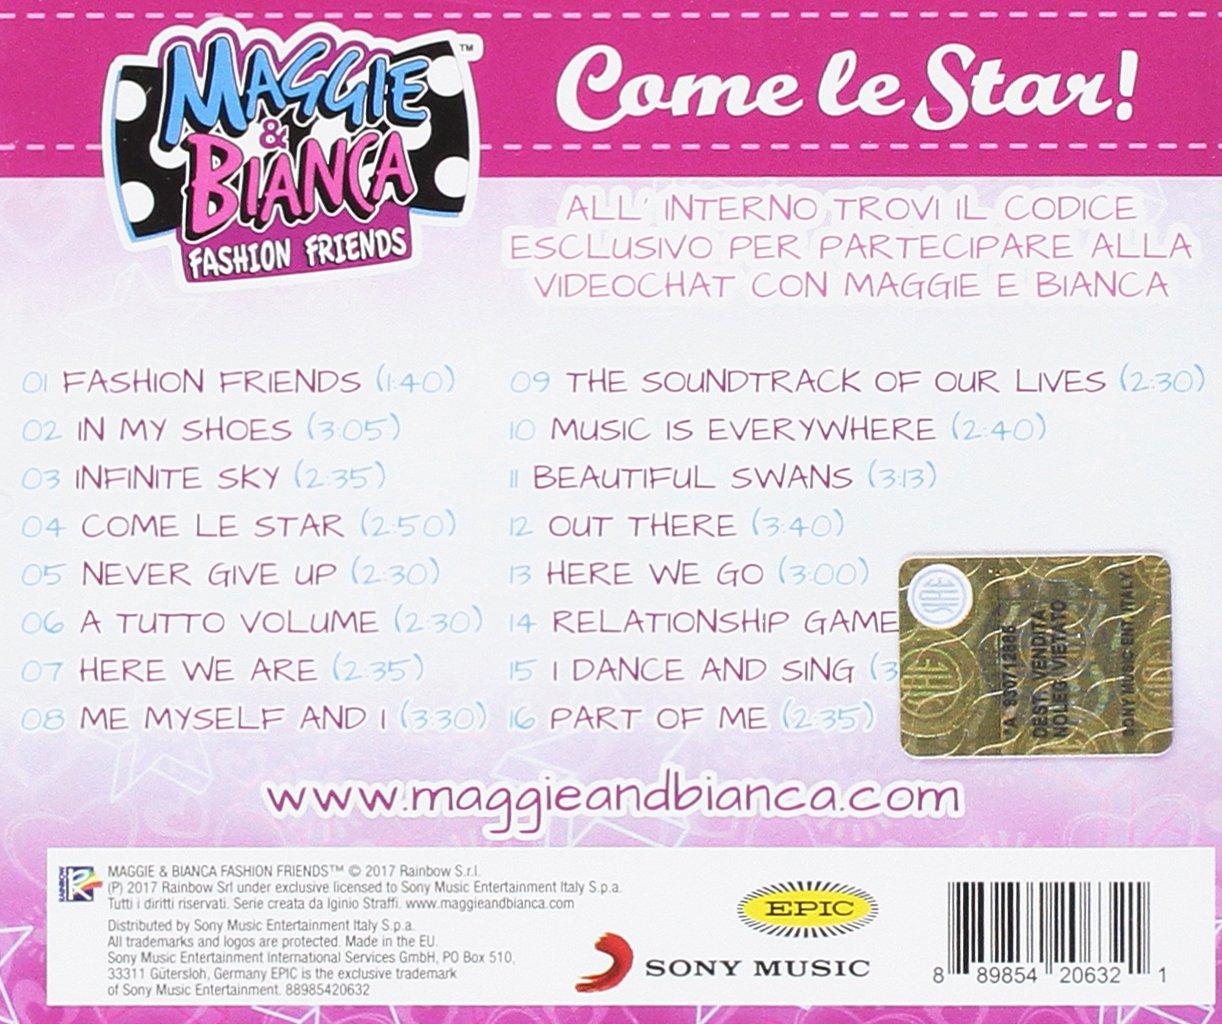 Simba - 109270020 - Carnet de Mode - Maggie & Bianca - www